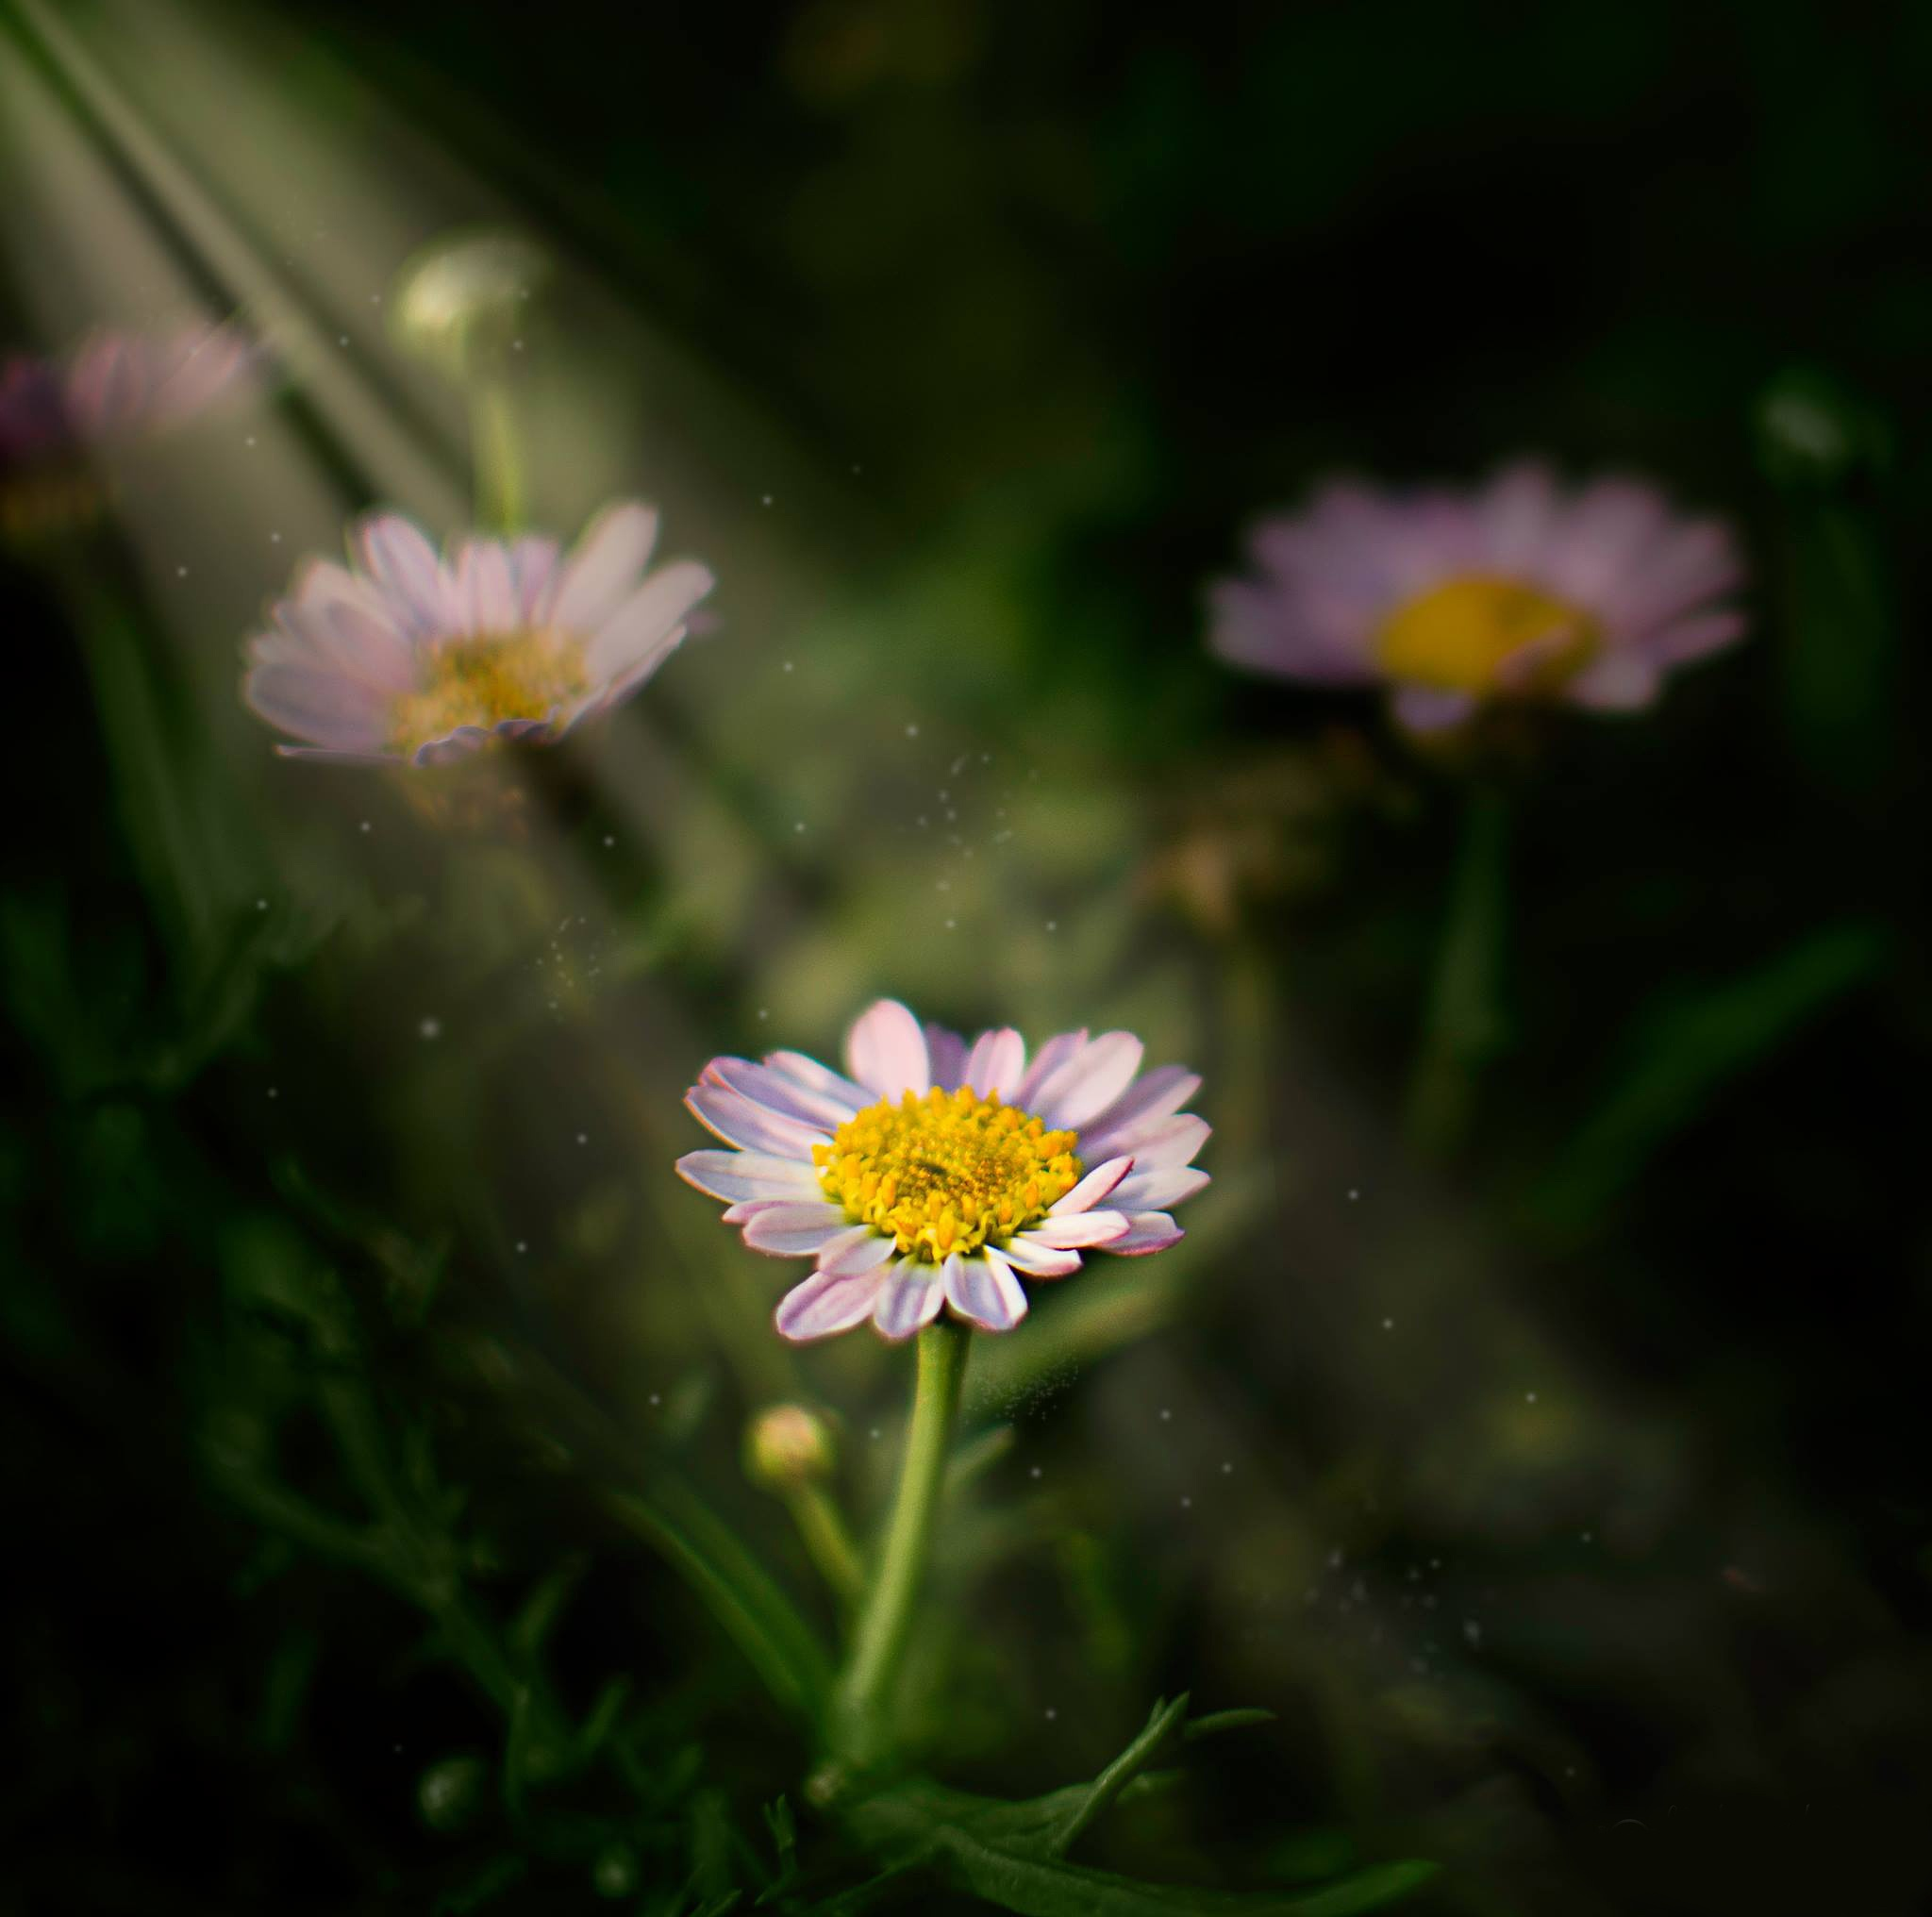 Ray of Light by Muhannad Salem